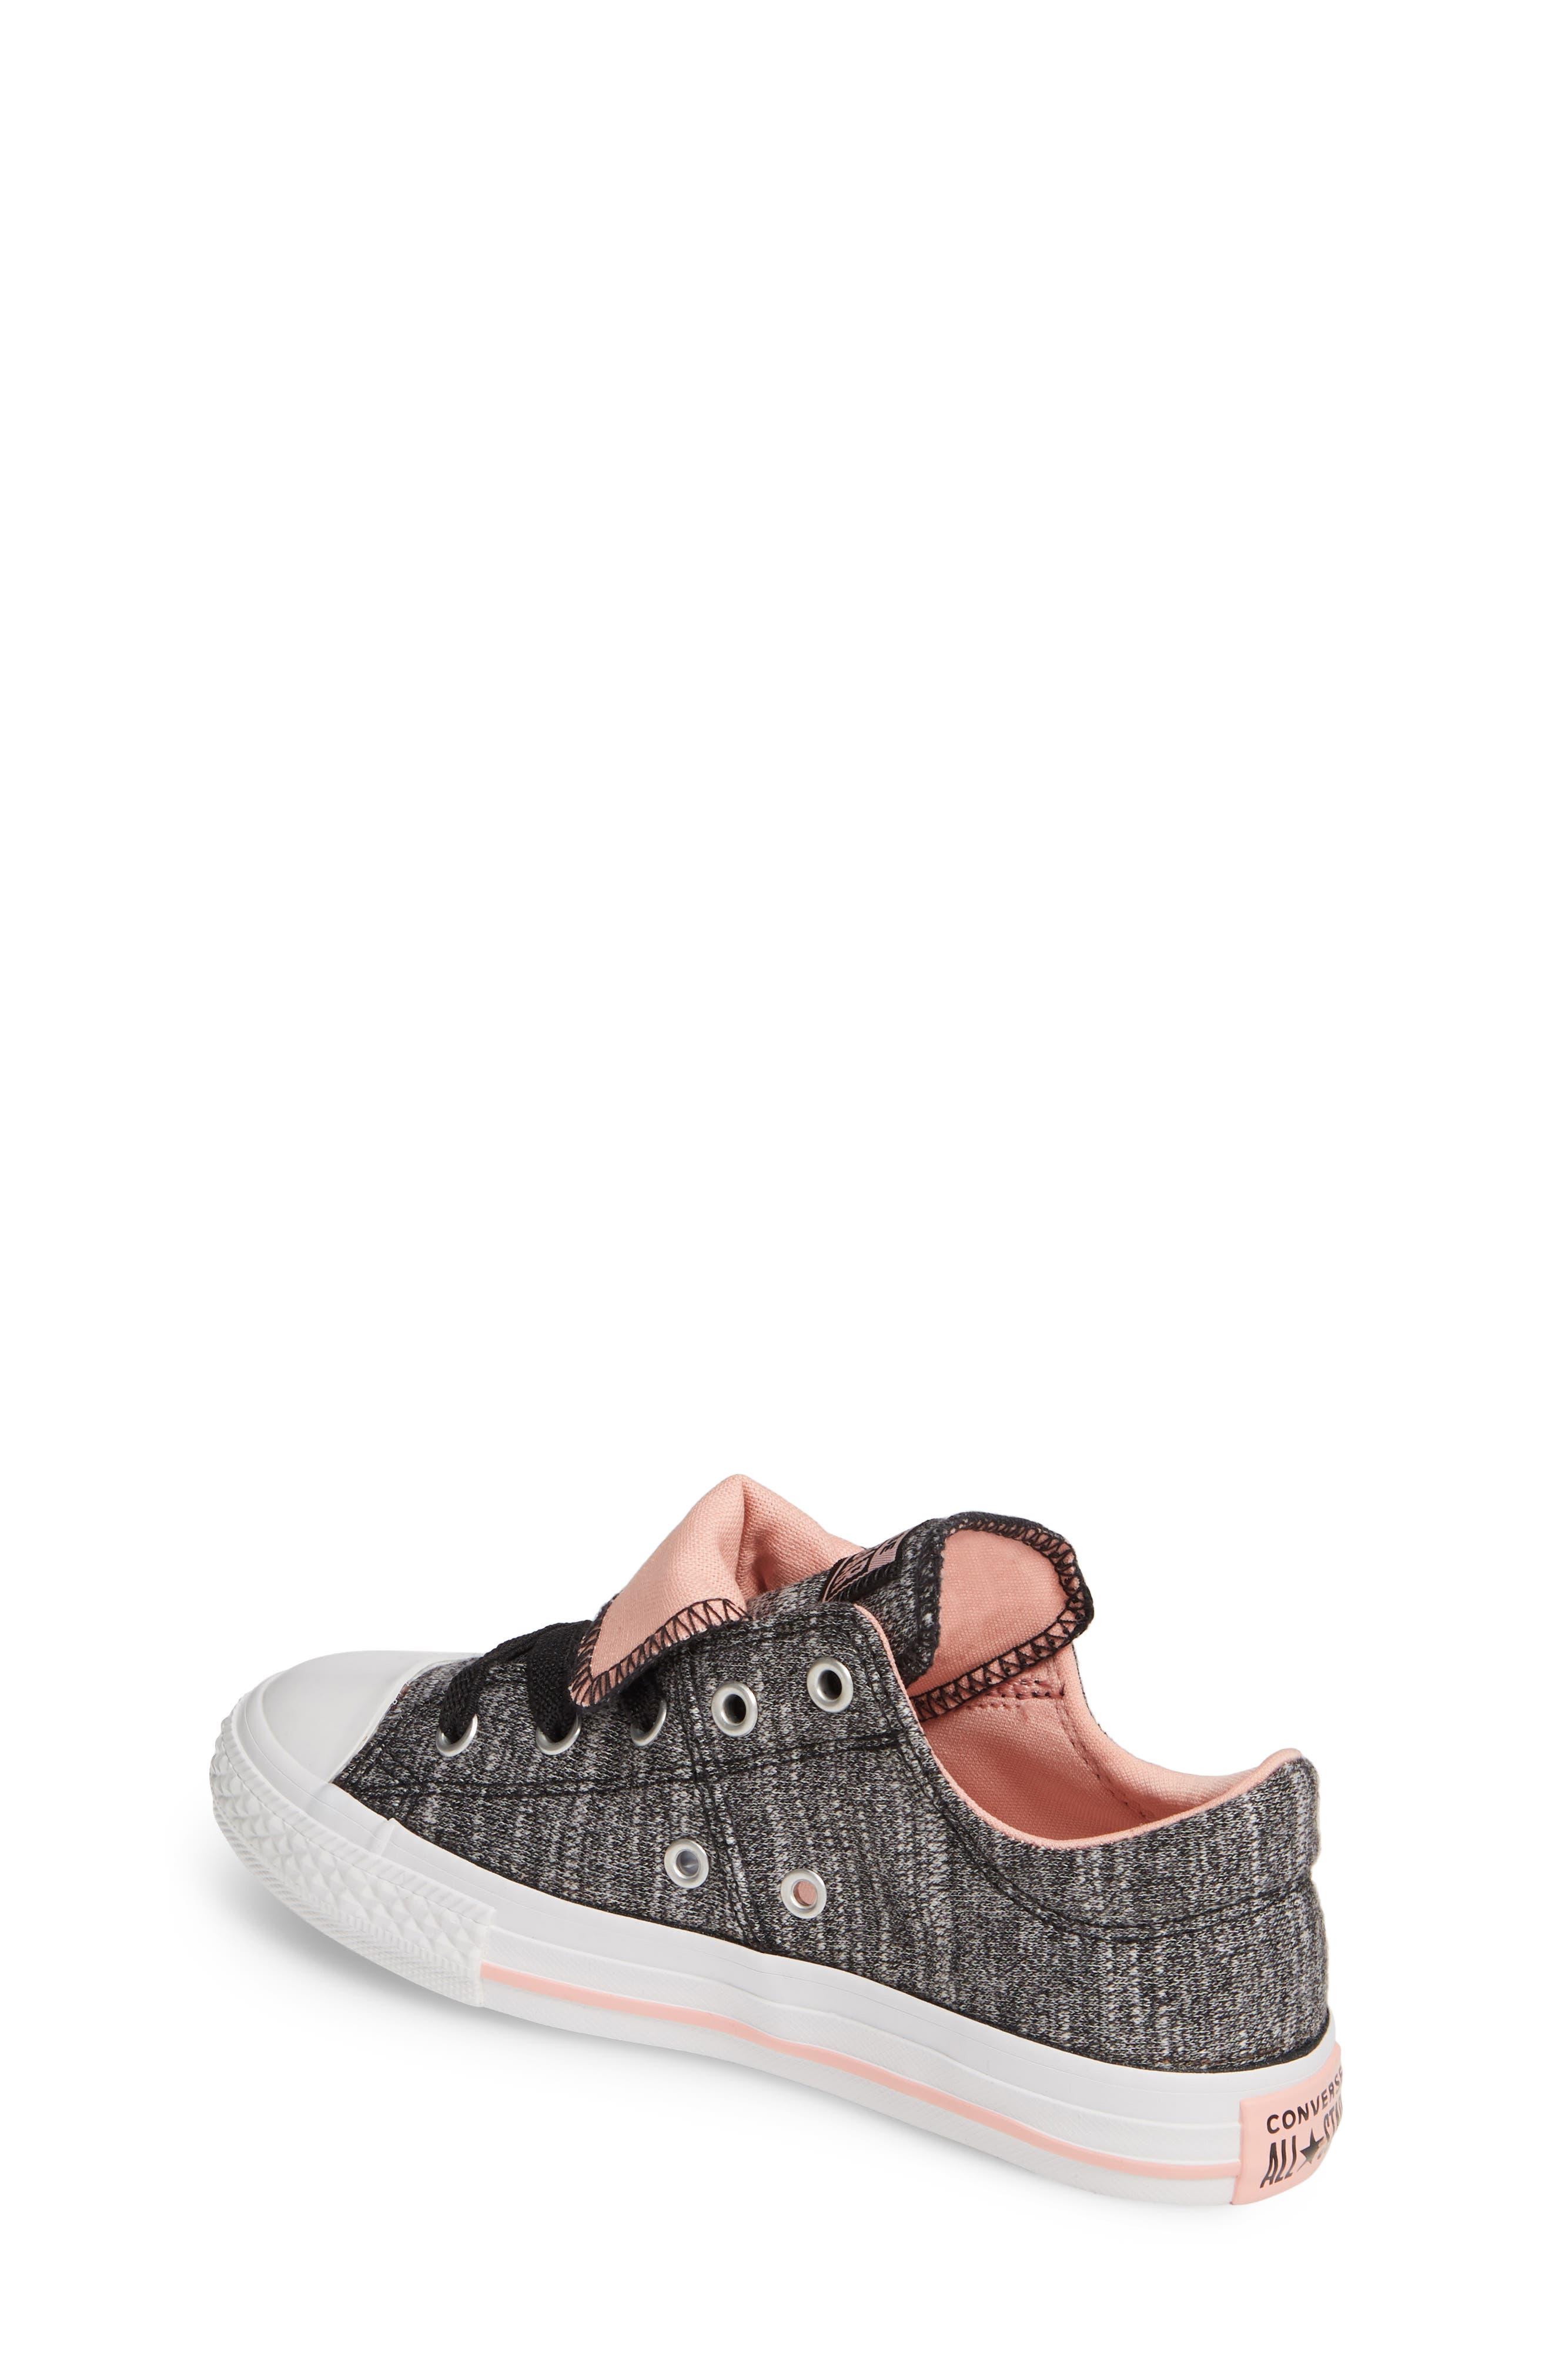 ceaf74a7738 Little Girls  Converse Shoes